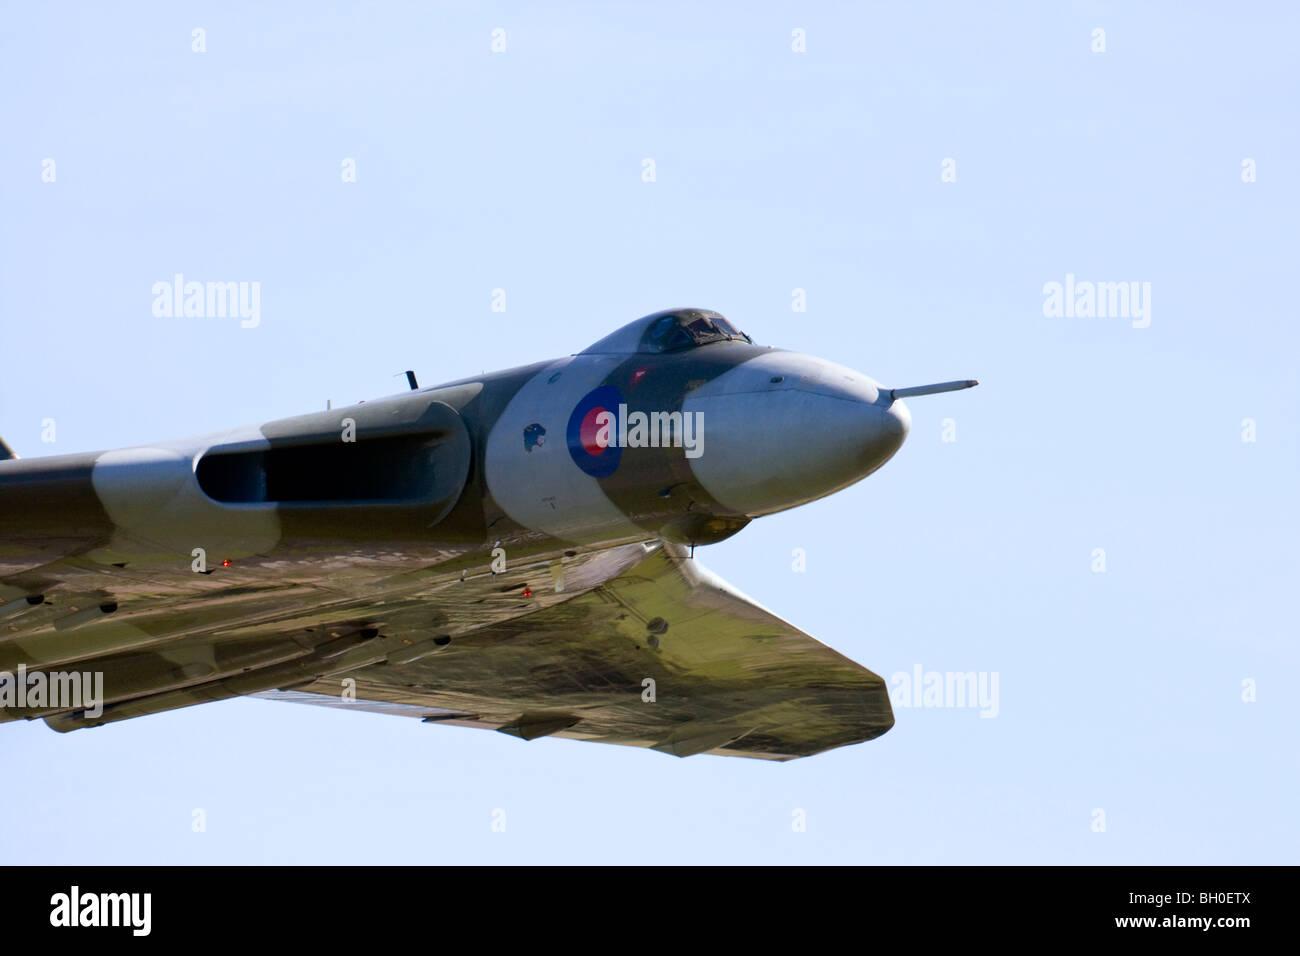 Vulcan bomber XH558 at RAF Leuchars Airshow 2009, Fife, Scotland - Stock Image